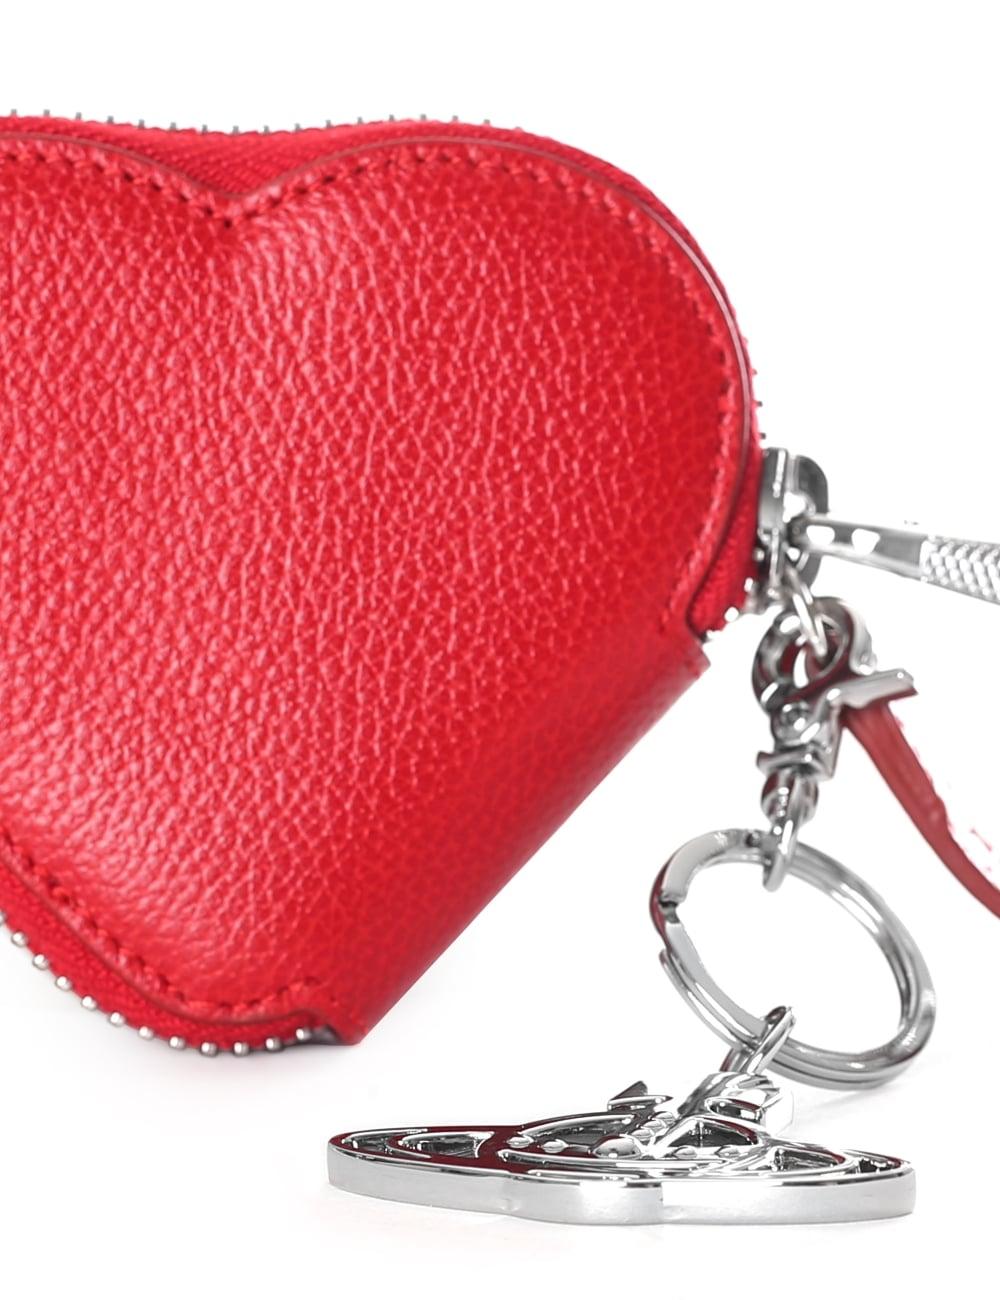 683788ba8c Vivienne Westwood Women's Johanna Heart Coin Case With Orb Gadget